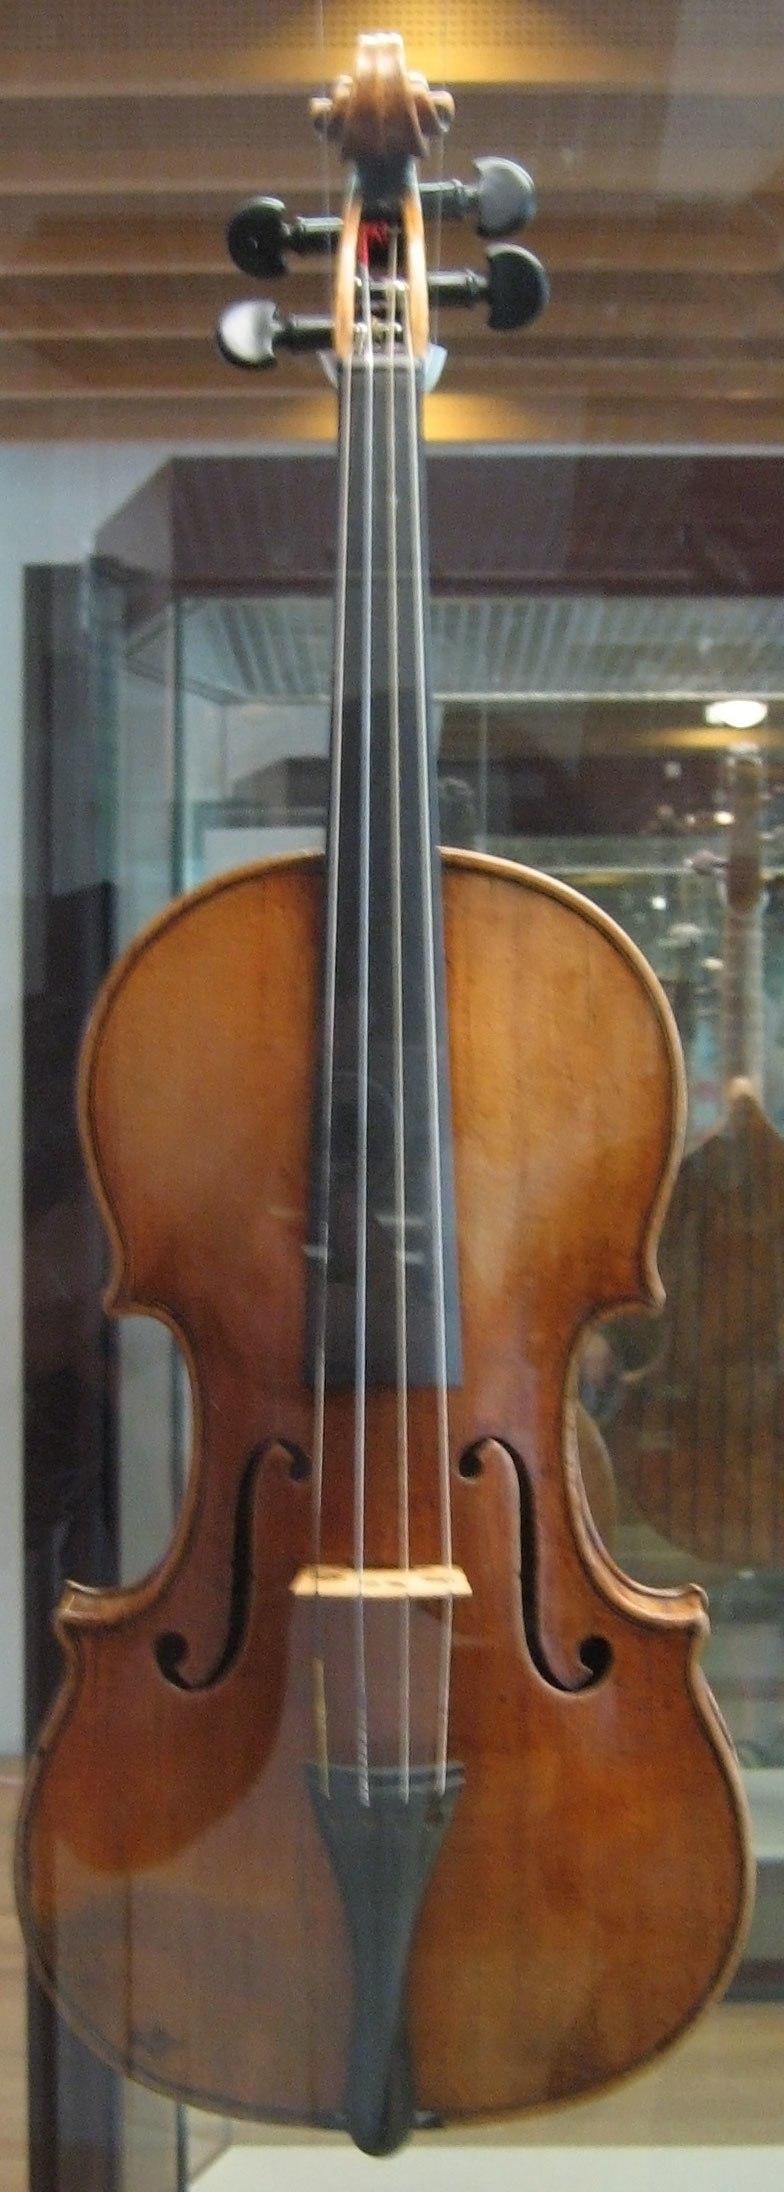 Stradivarius violin front